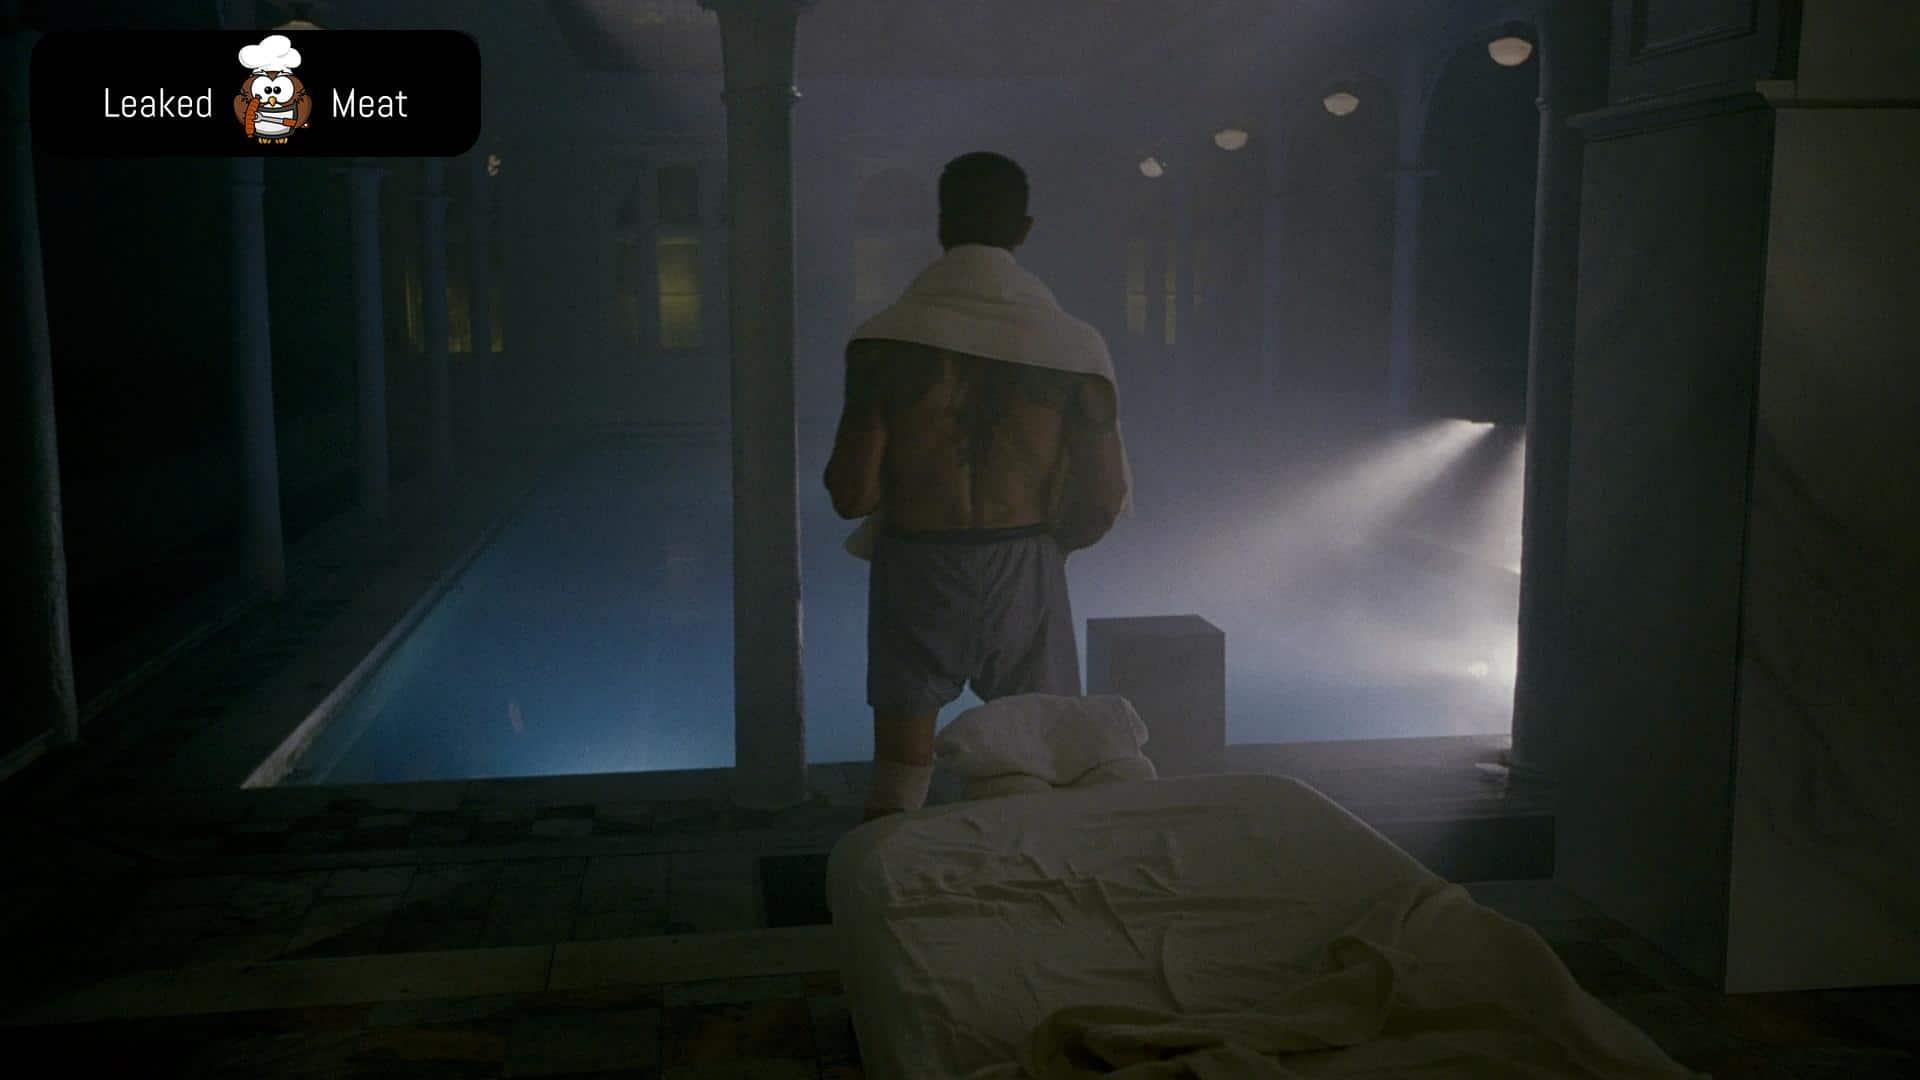 Sylvester Stallone | LeakedMeat 7